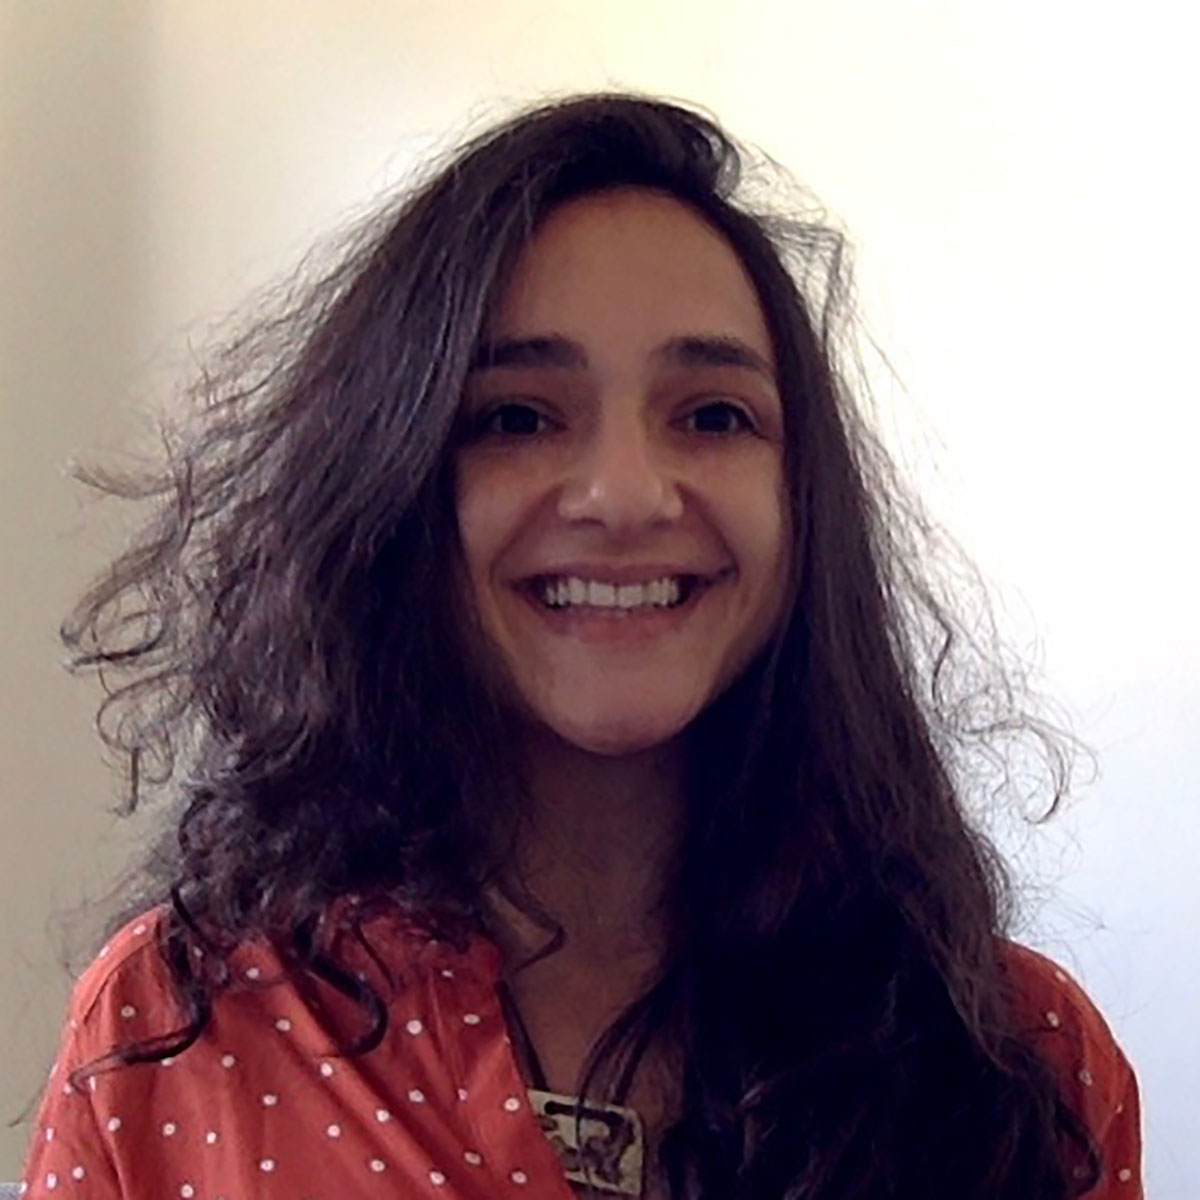 Safia Khaled